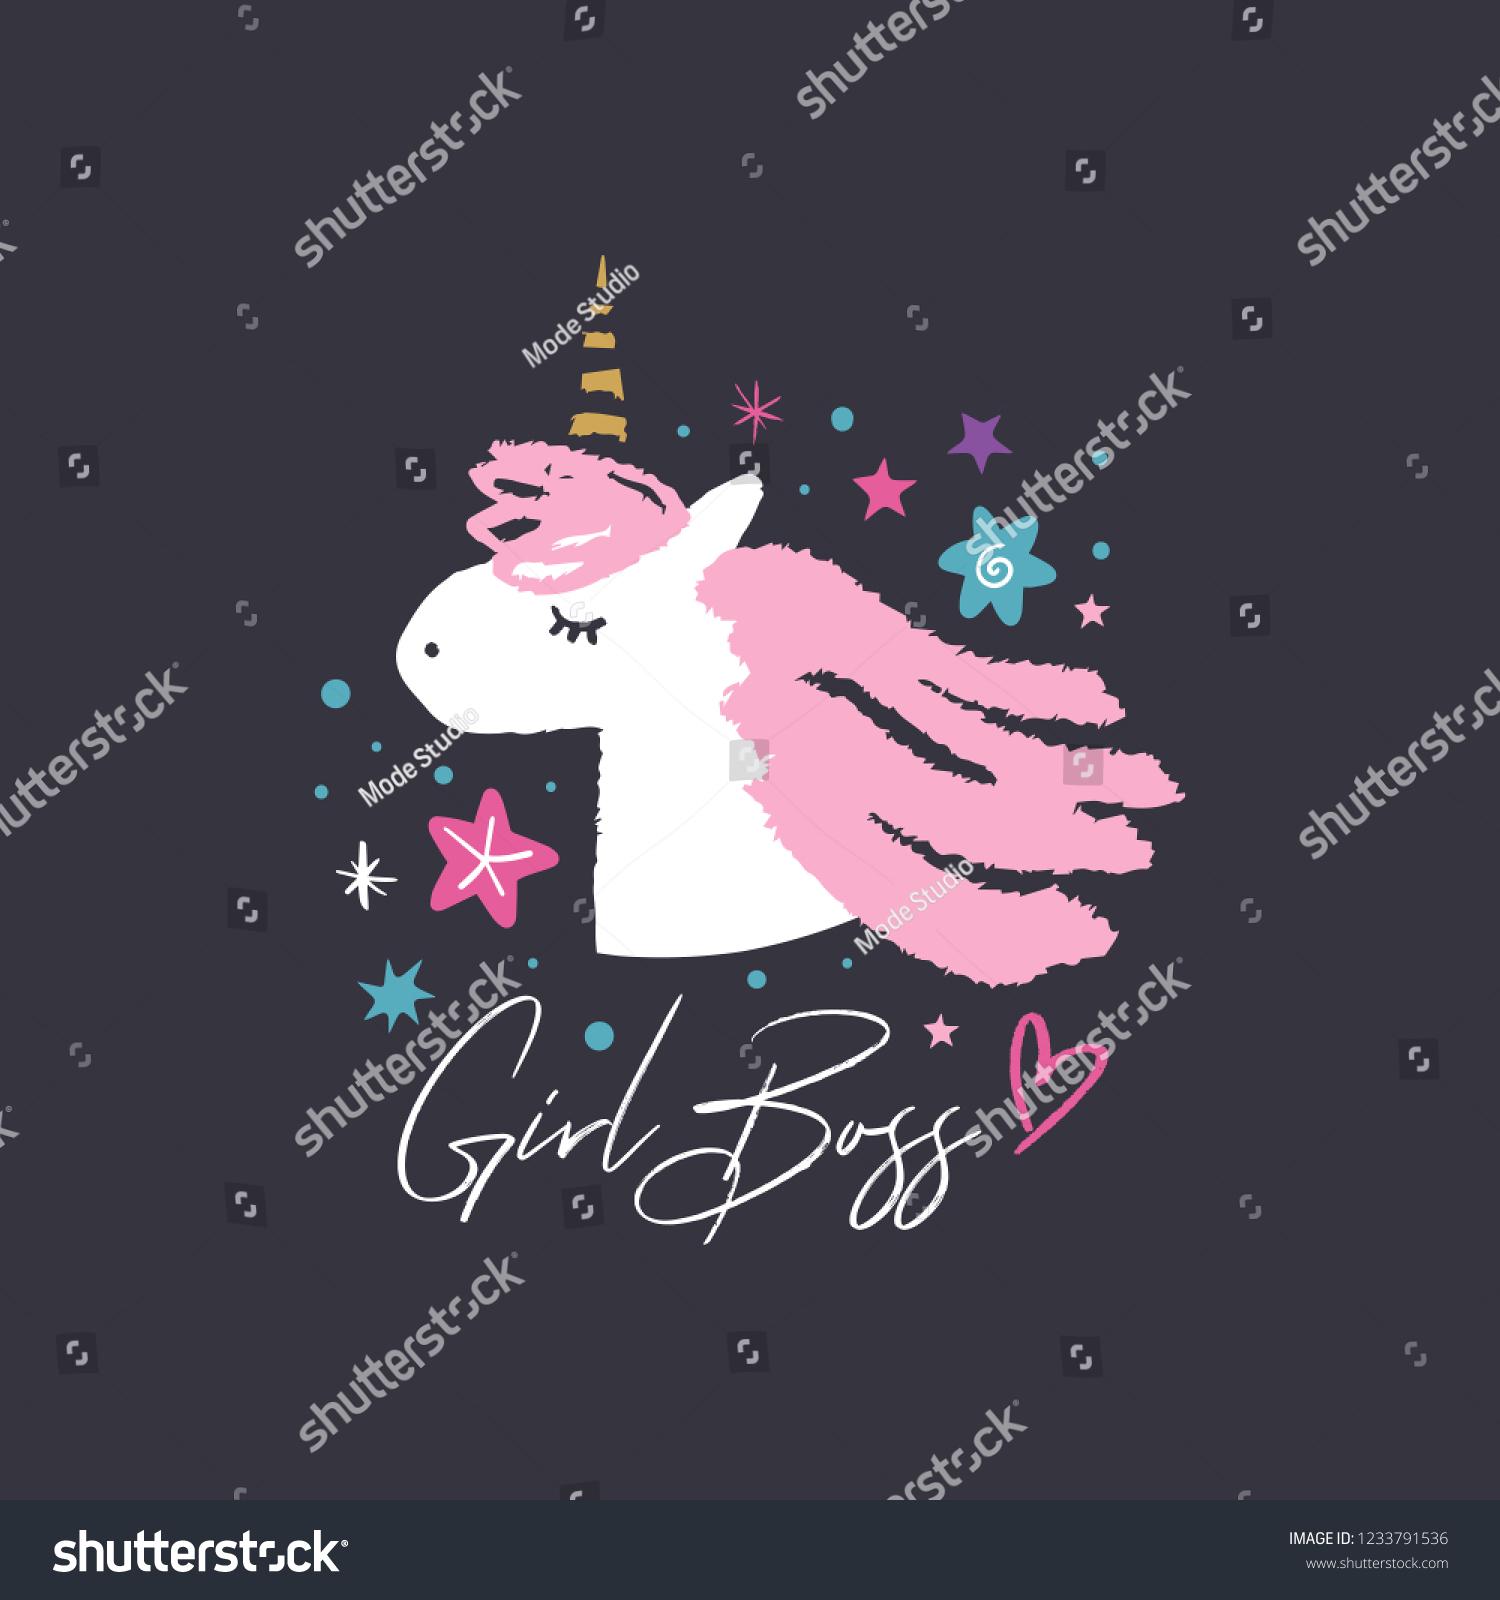 stock vector unicorn head cute art baby stylish illustration nursery wallpaper girl boss text vector and jpg 1233791536